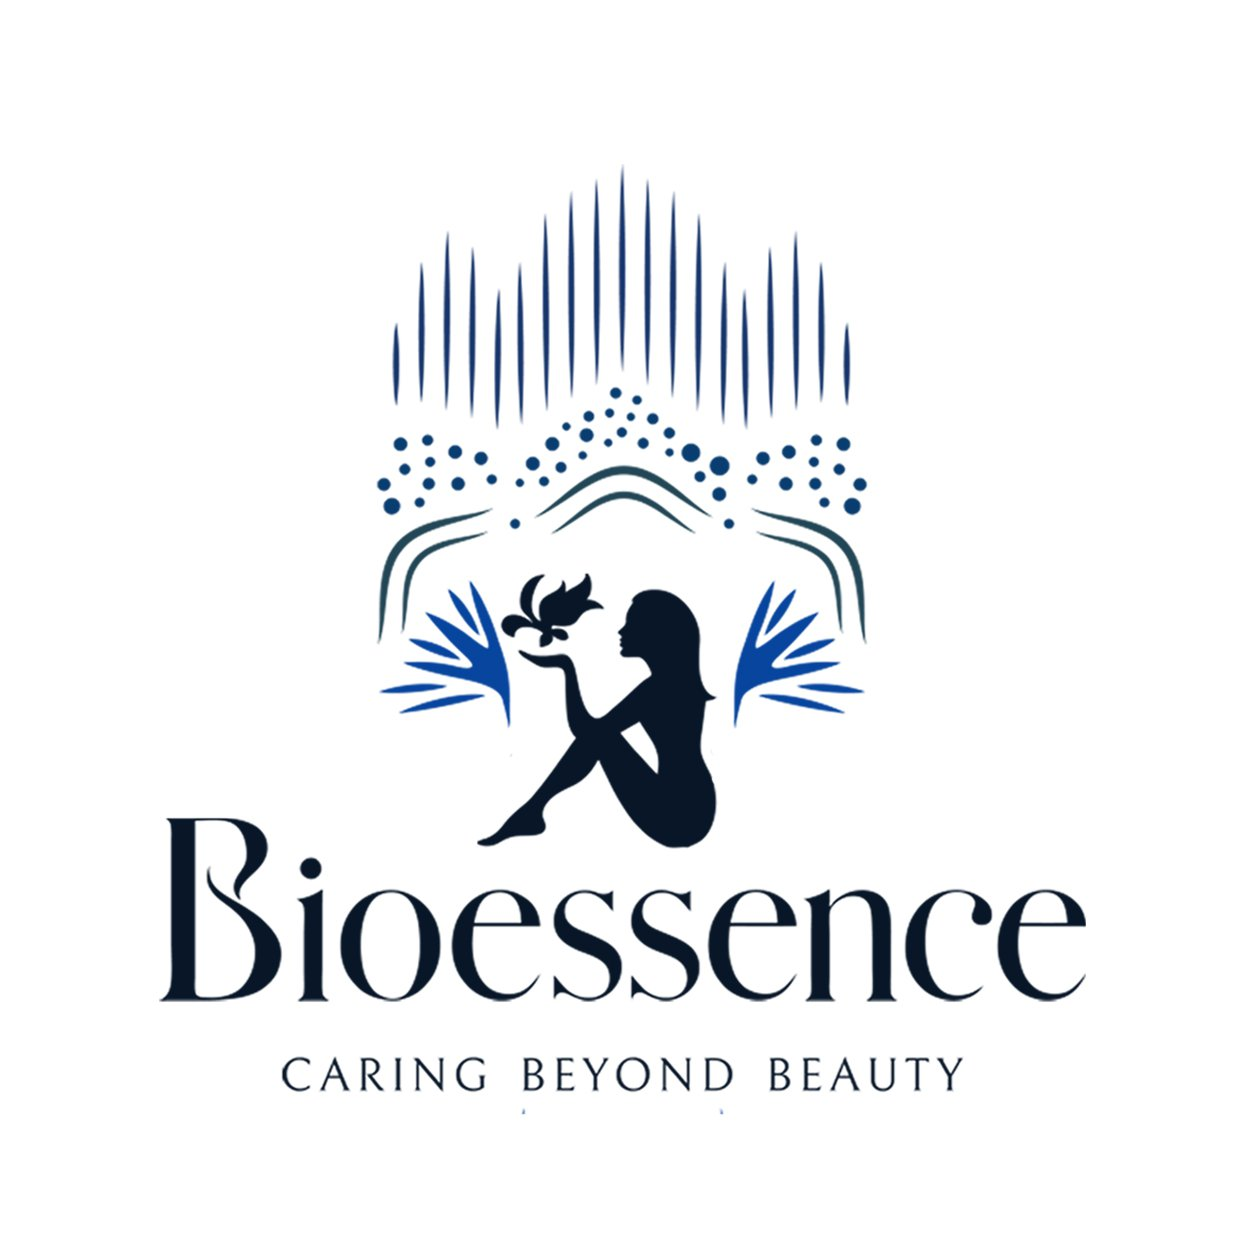 Bioessence Facial & Slimming Inc.